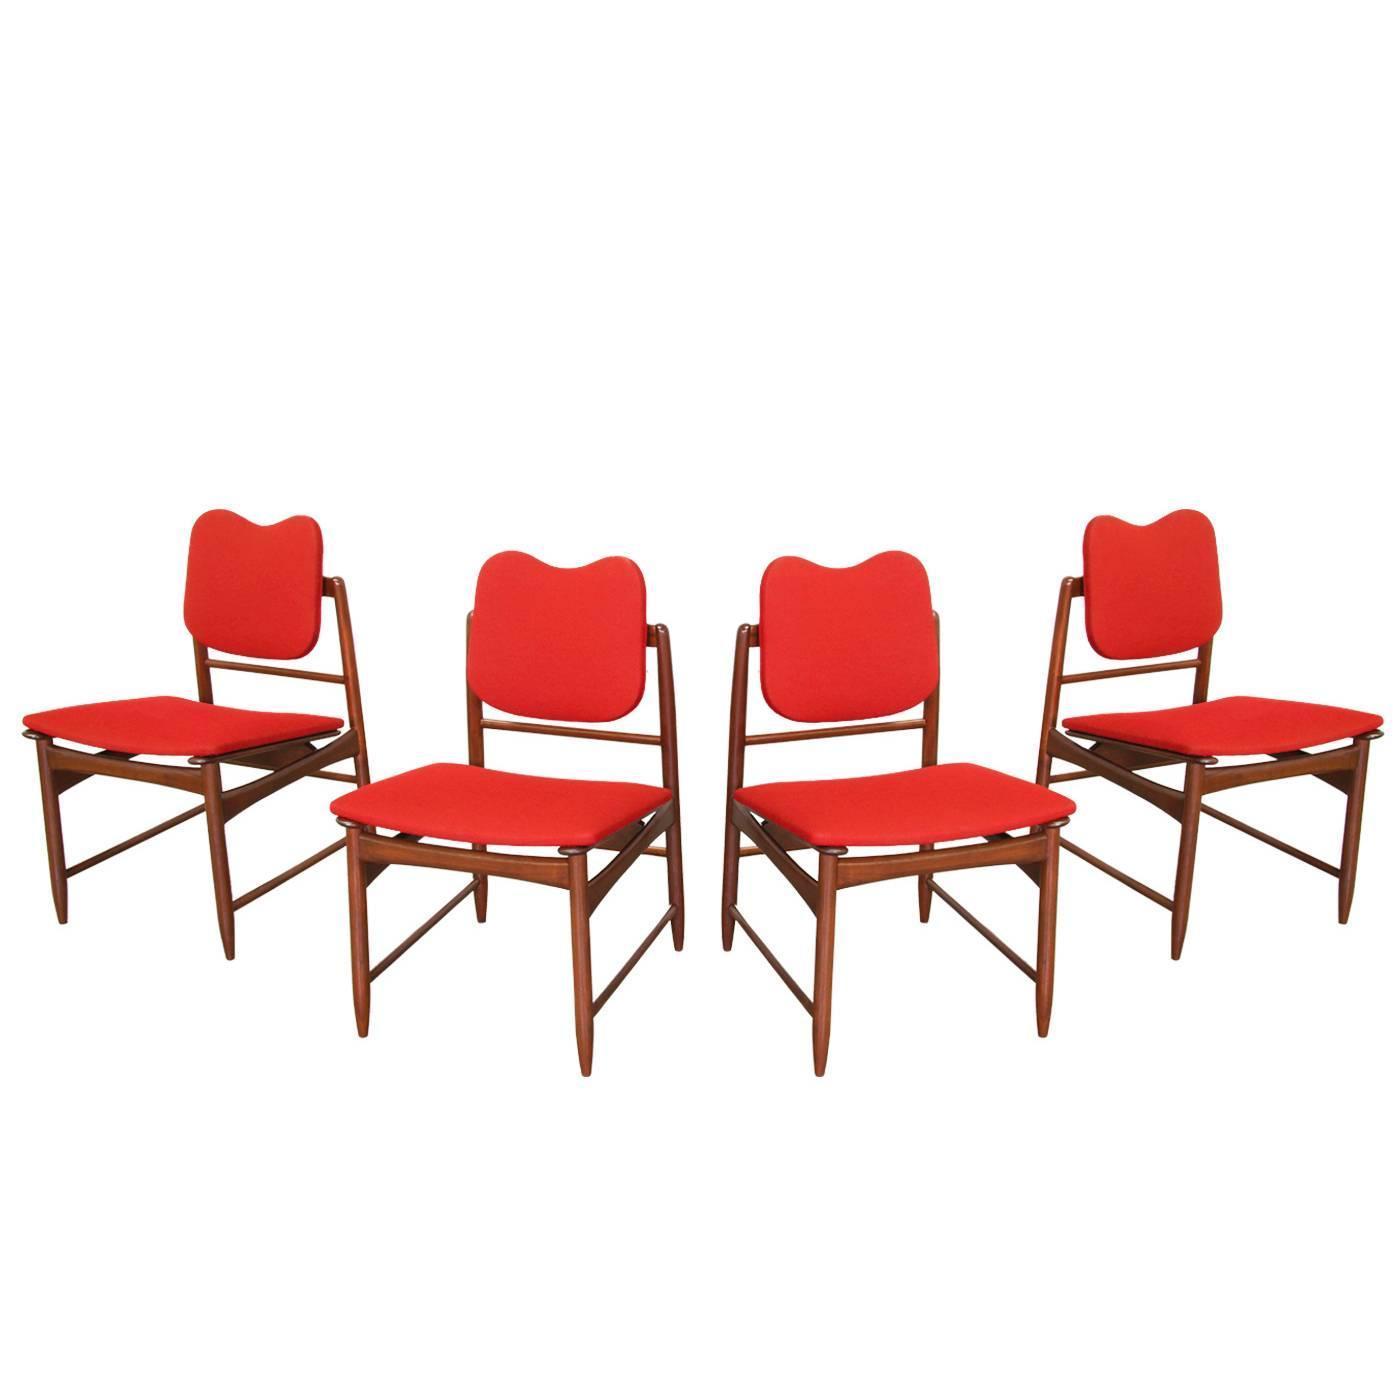 Greta m grossman dining chairs for glenn of california